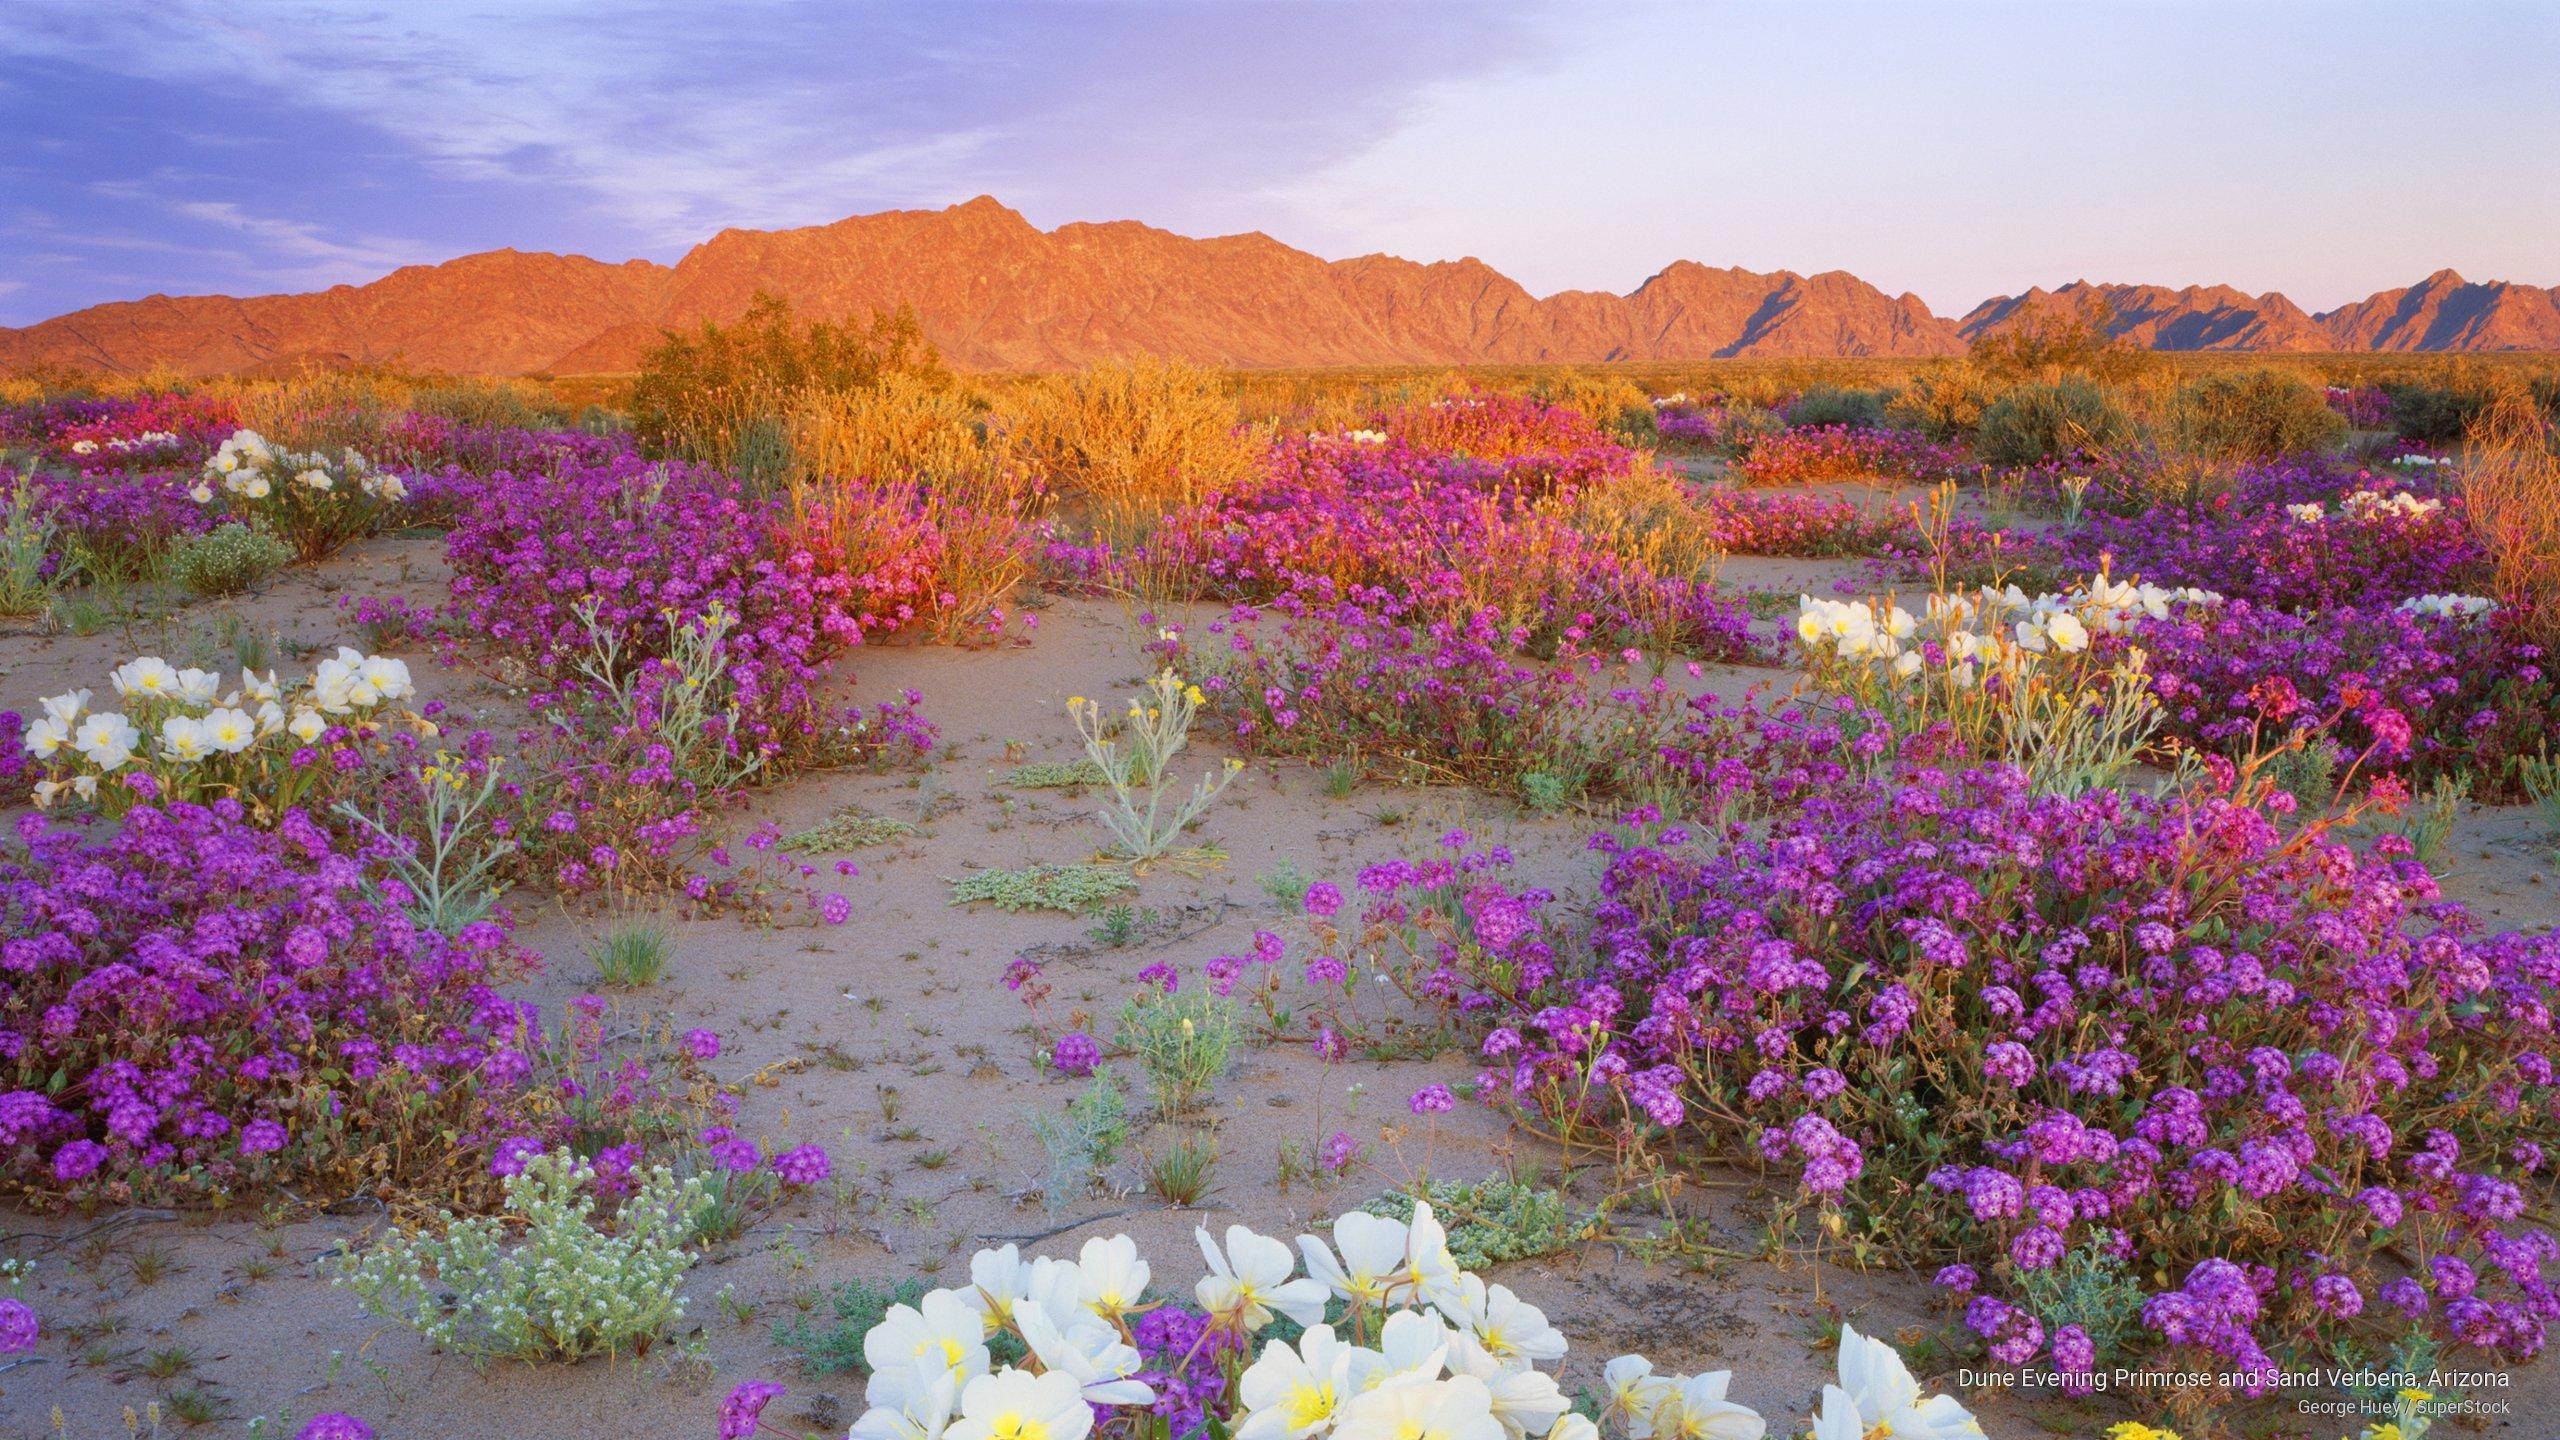 Dune Evening Primrose and Sand Verbena, Arizona